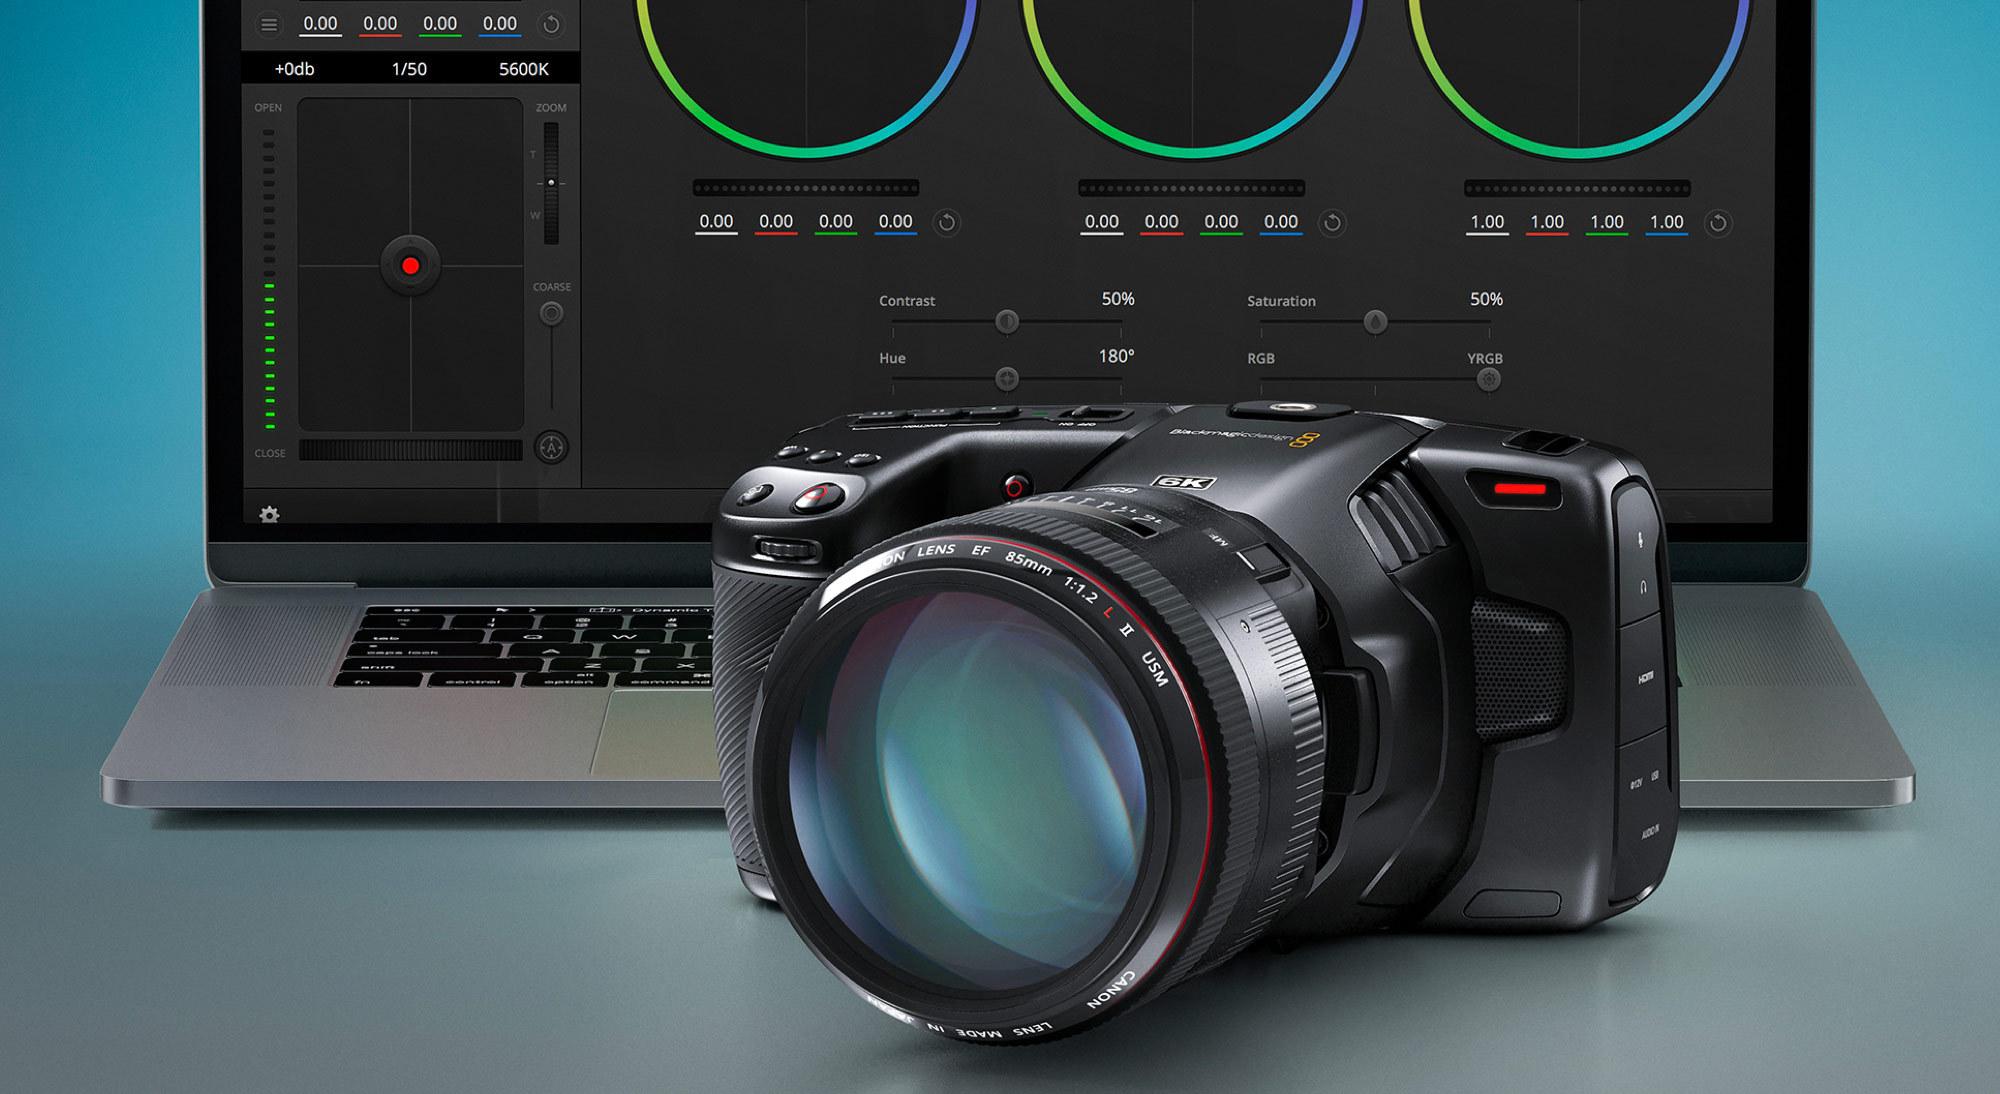 Blackmagic Design Announces New Low Price For Pocket Cinema Camera 6k Business Wire